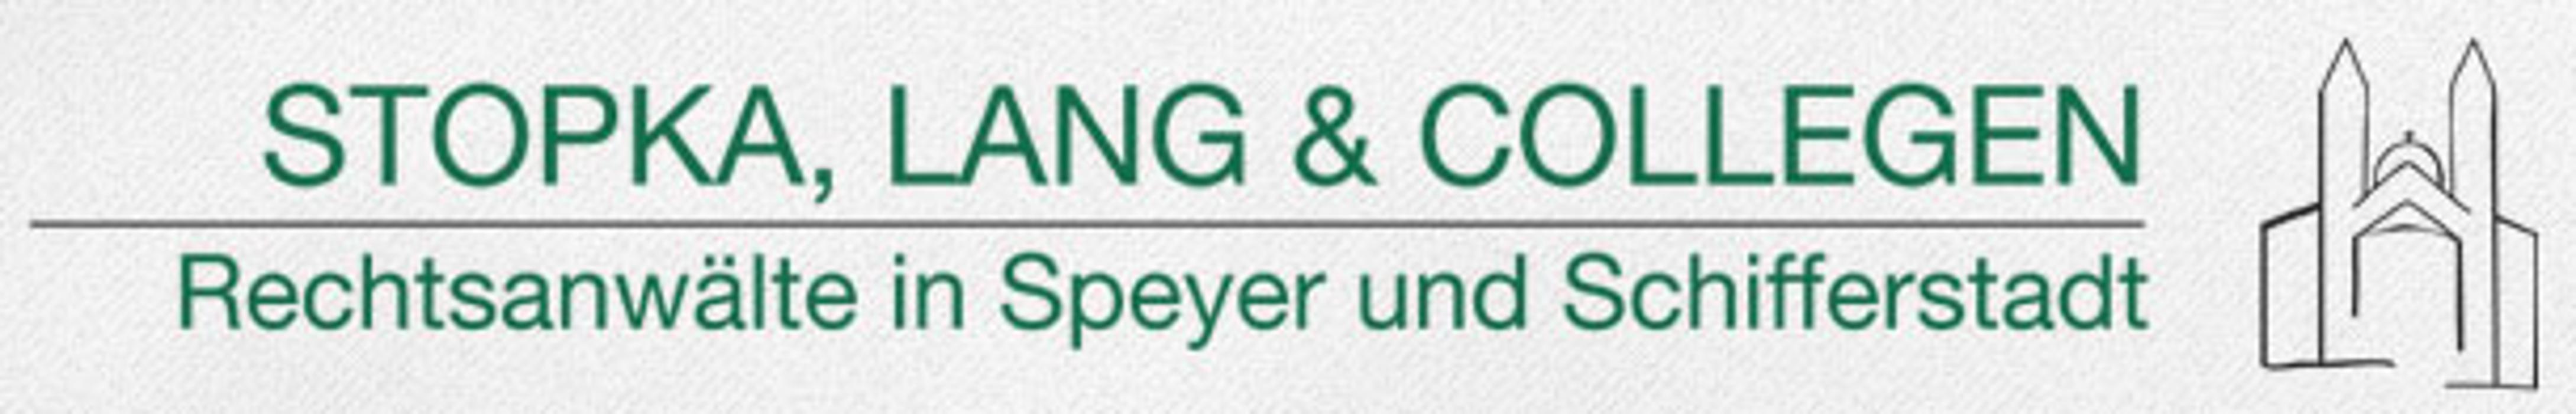 Bild zu Stopka - Lang - Baumann- Geppert Rechtsanwälte in Speyer